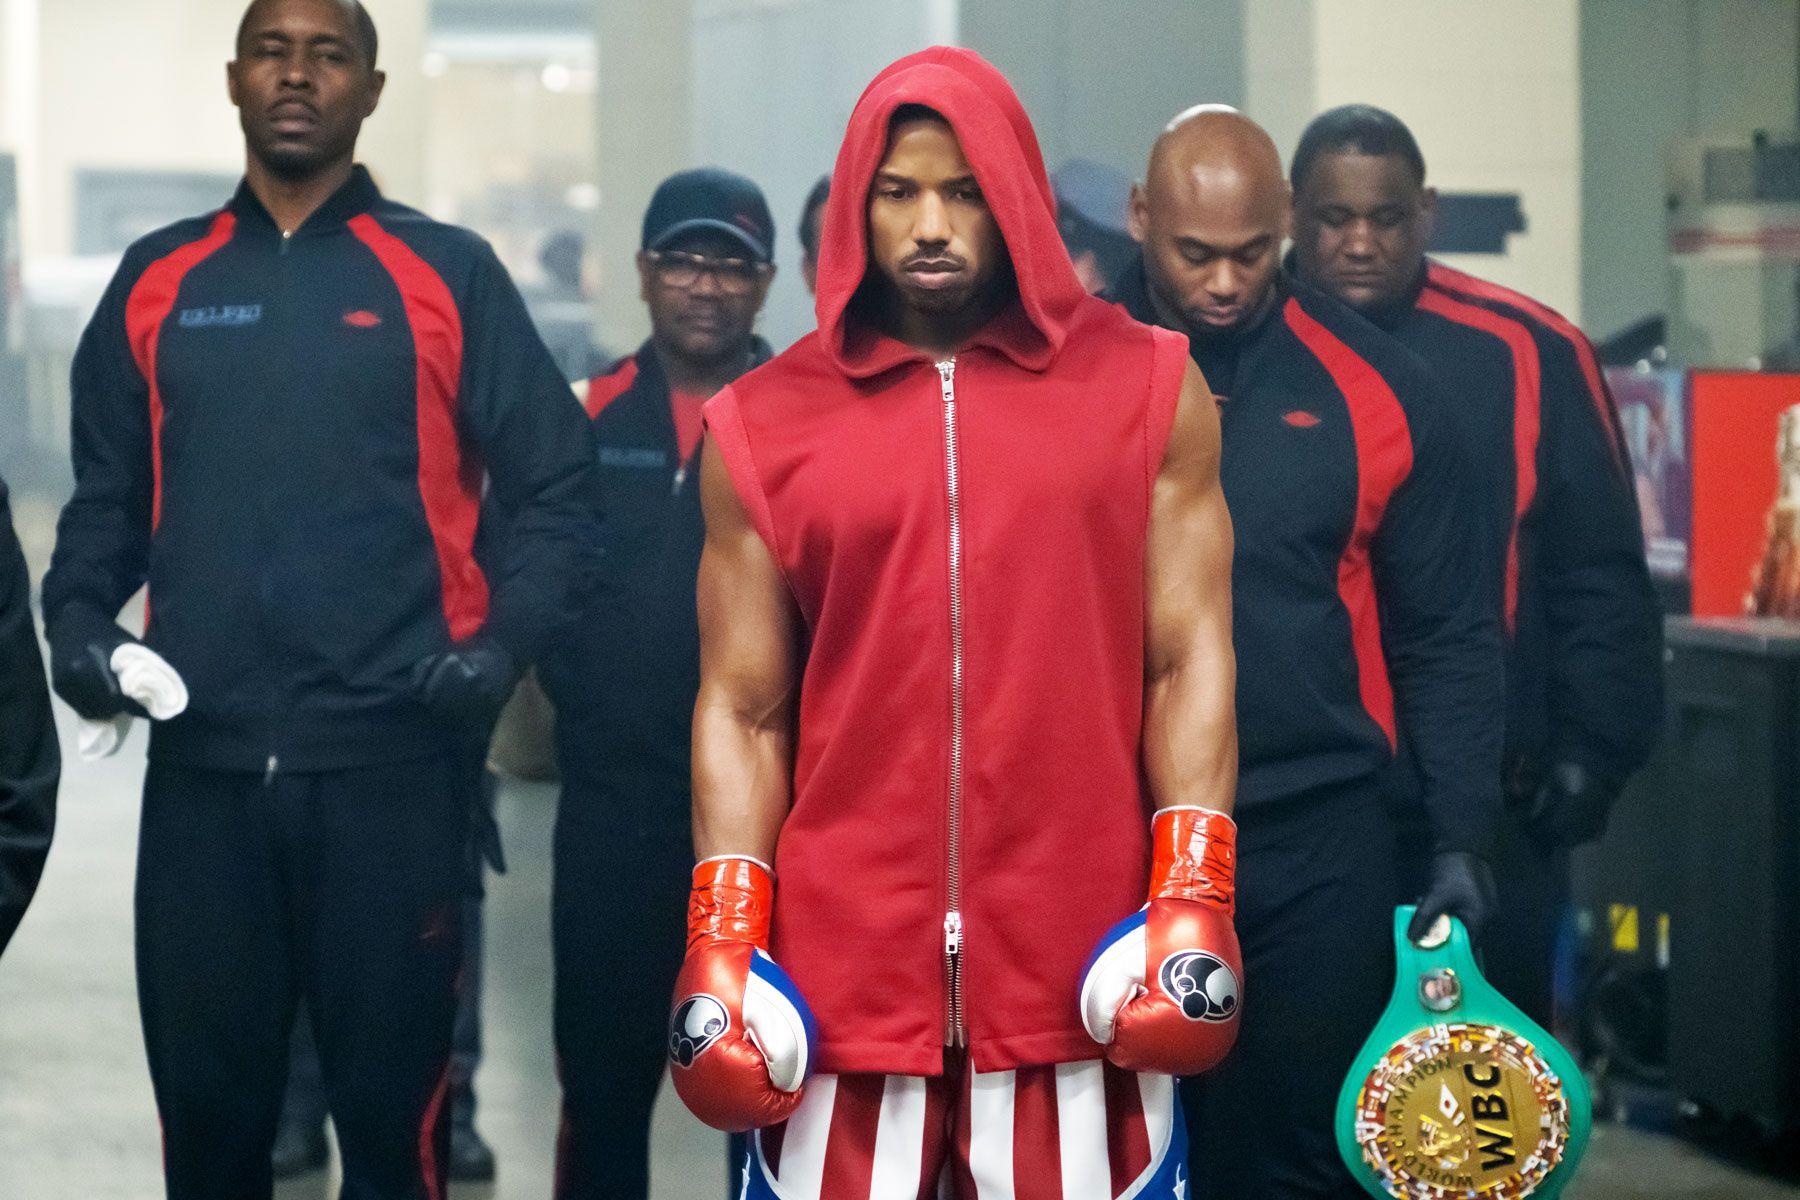 Creed II, Michael B Jordan, Fitness